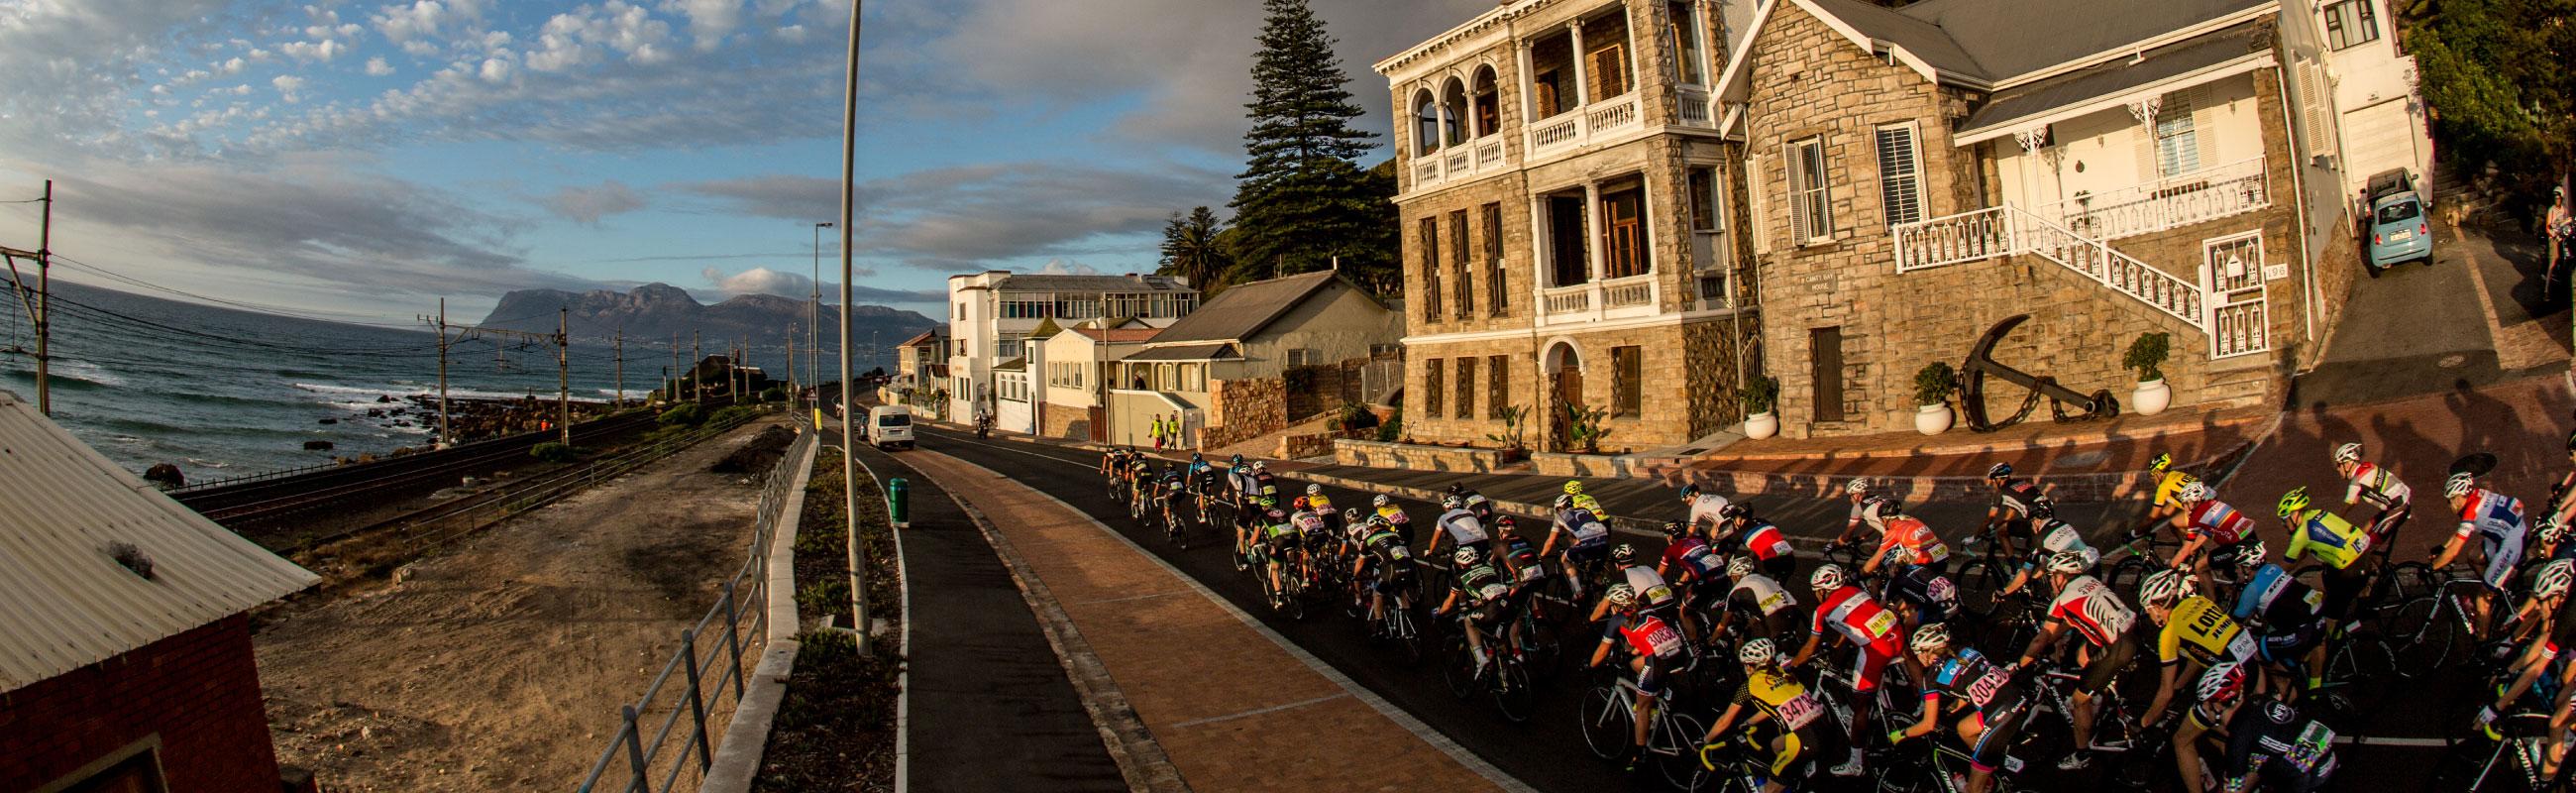 Cape Town Cycle Tour 2019cape Town Cycle Tour